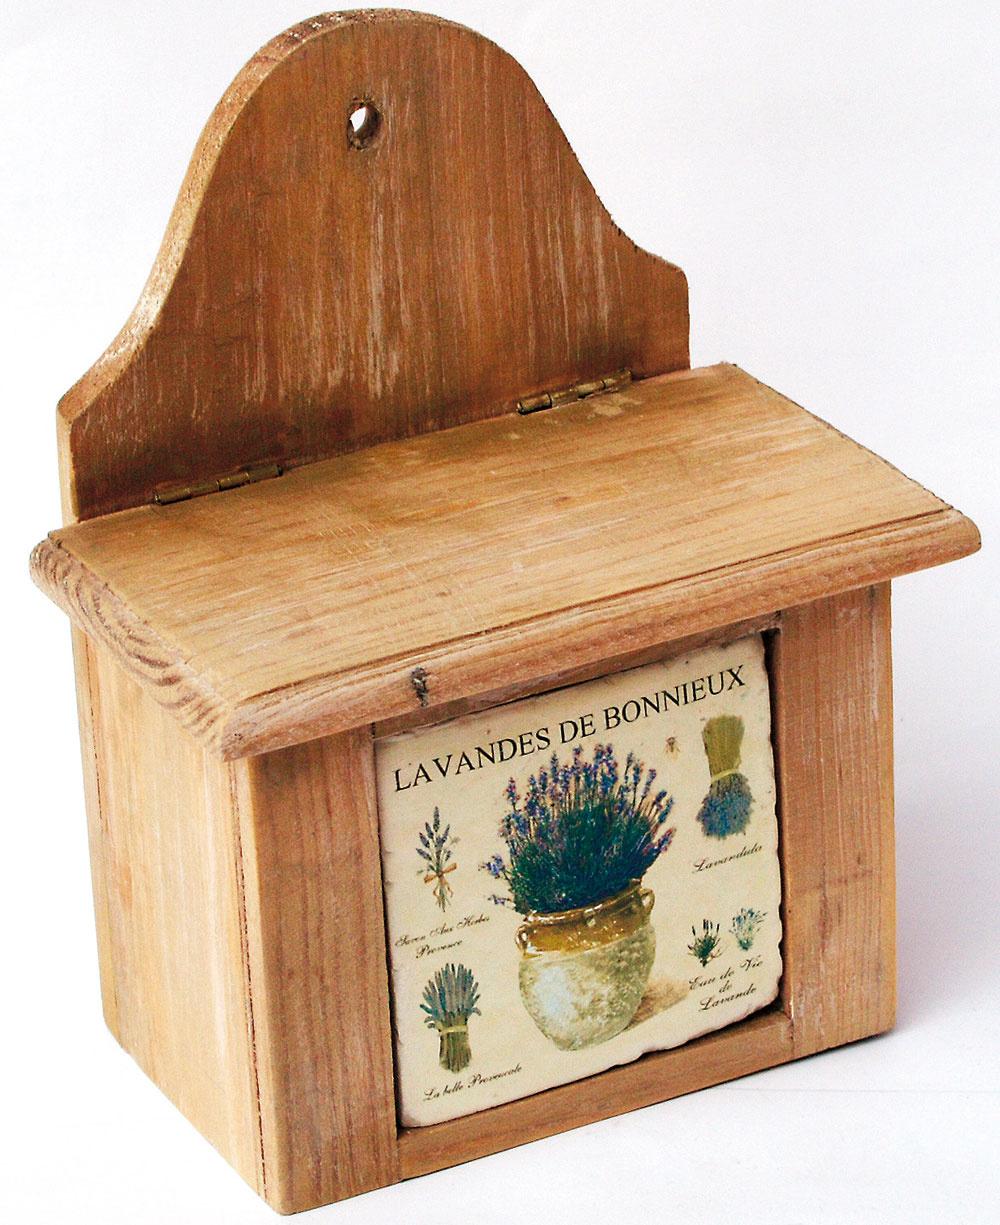 Dóza na sušené bylinky Lavandes de Bonnieux, 9,99 €